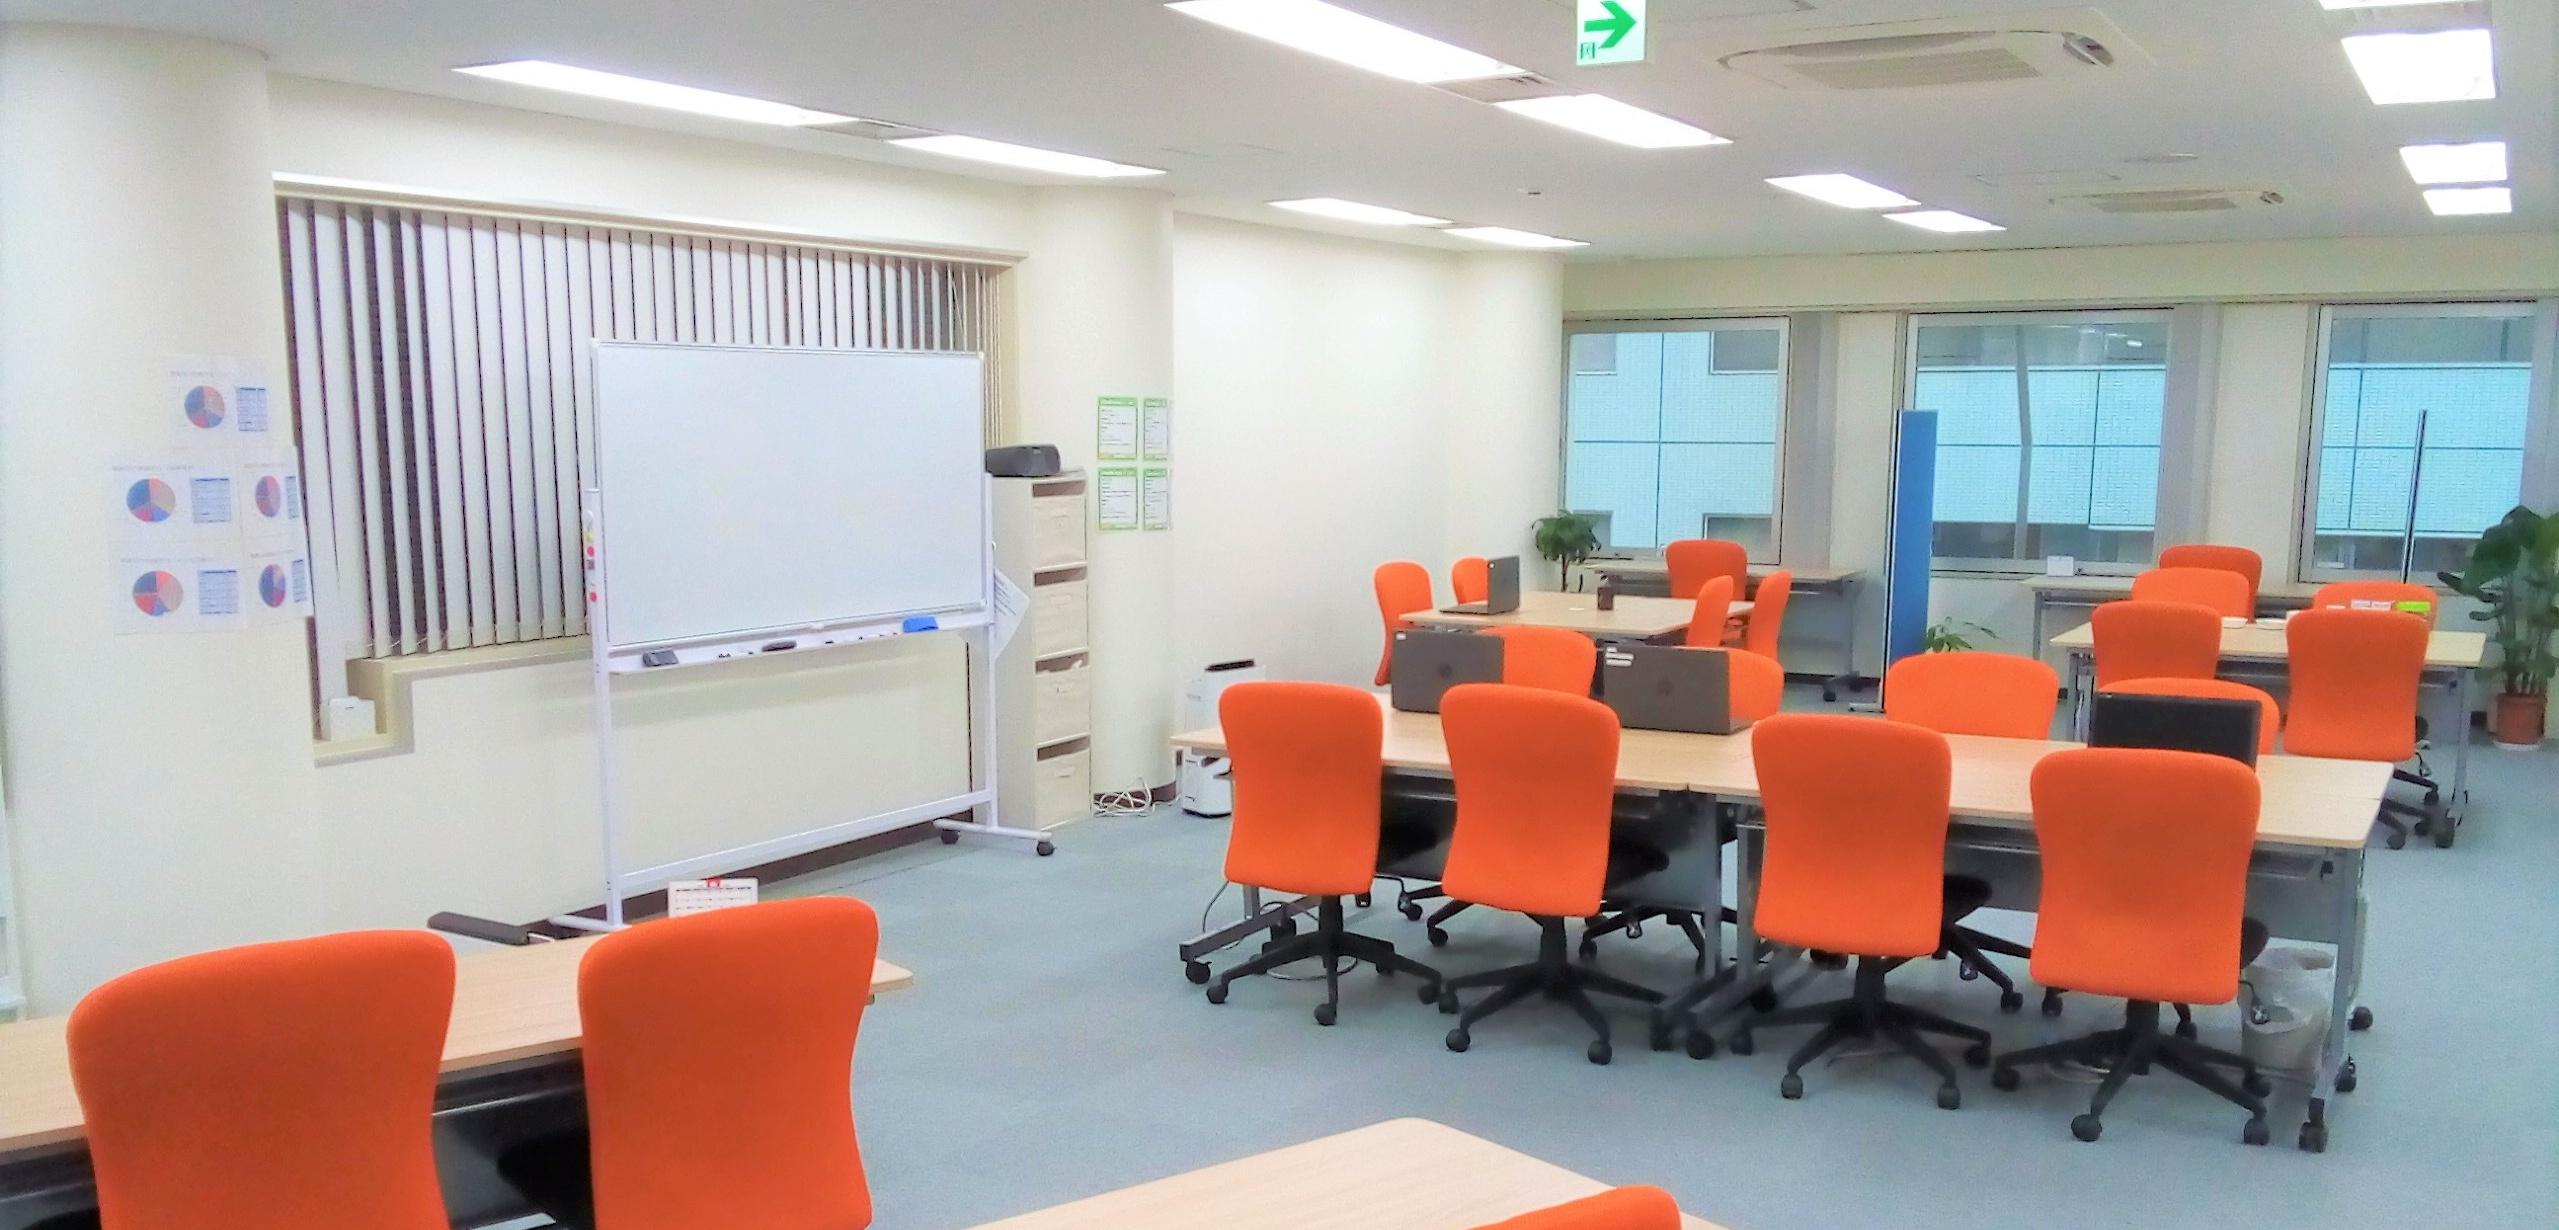 Cocorport(旧Melk)府中駅前Office